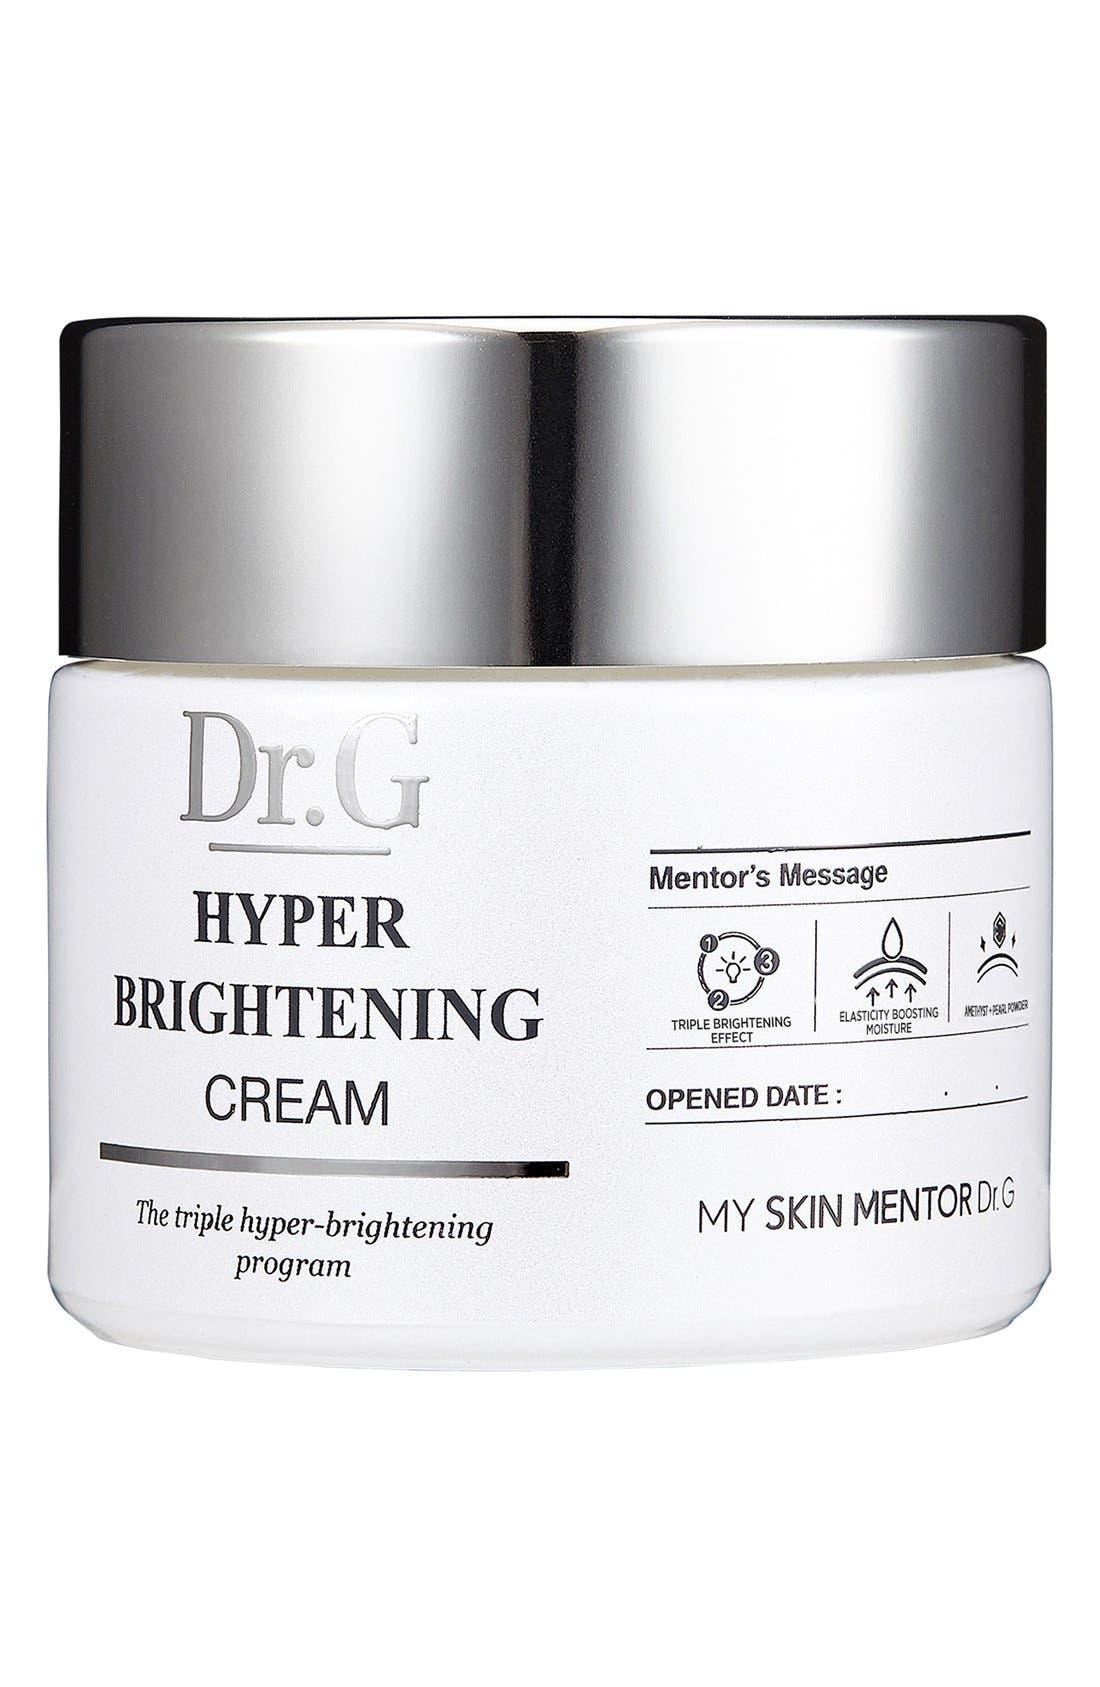 My Skin Mentor Dr. G Beauty Hyper Brightening Cream (Nordstrom Exclusive)